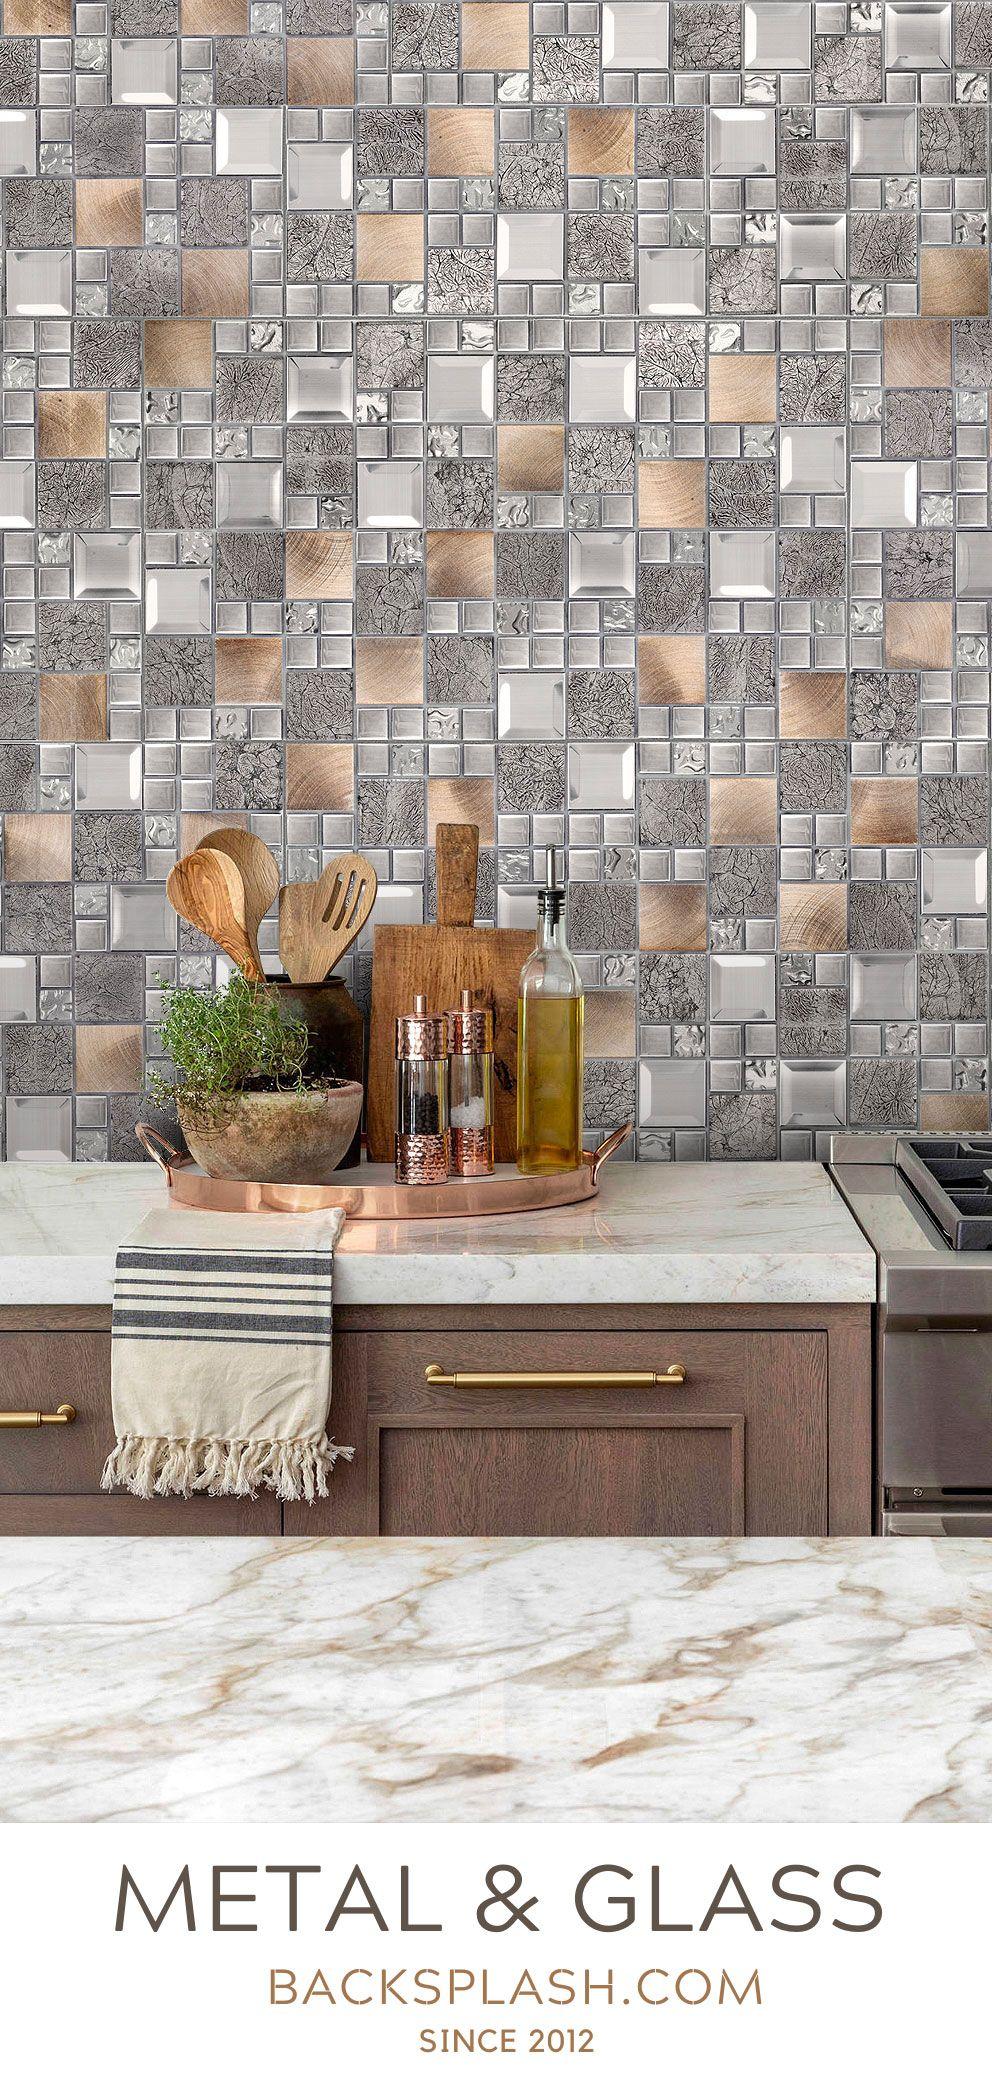 22 brown kitchen backsplash tiles ideas